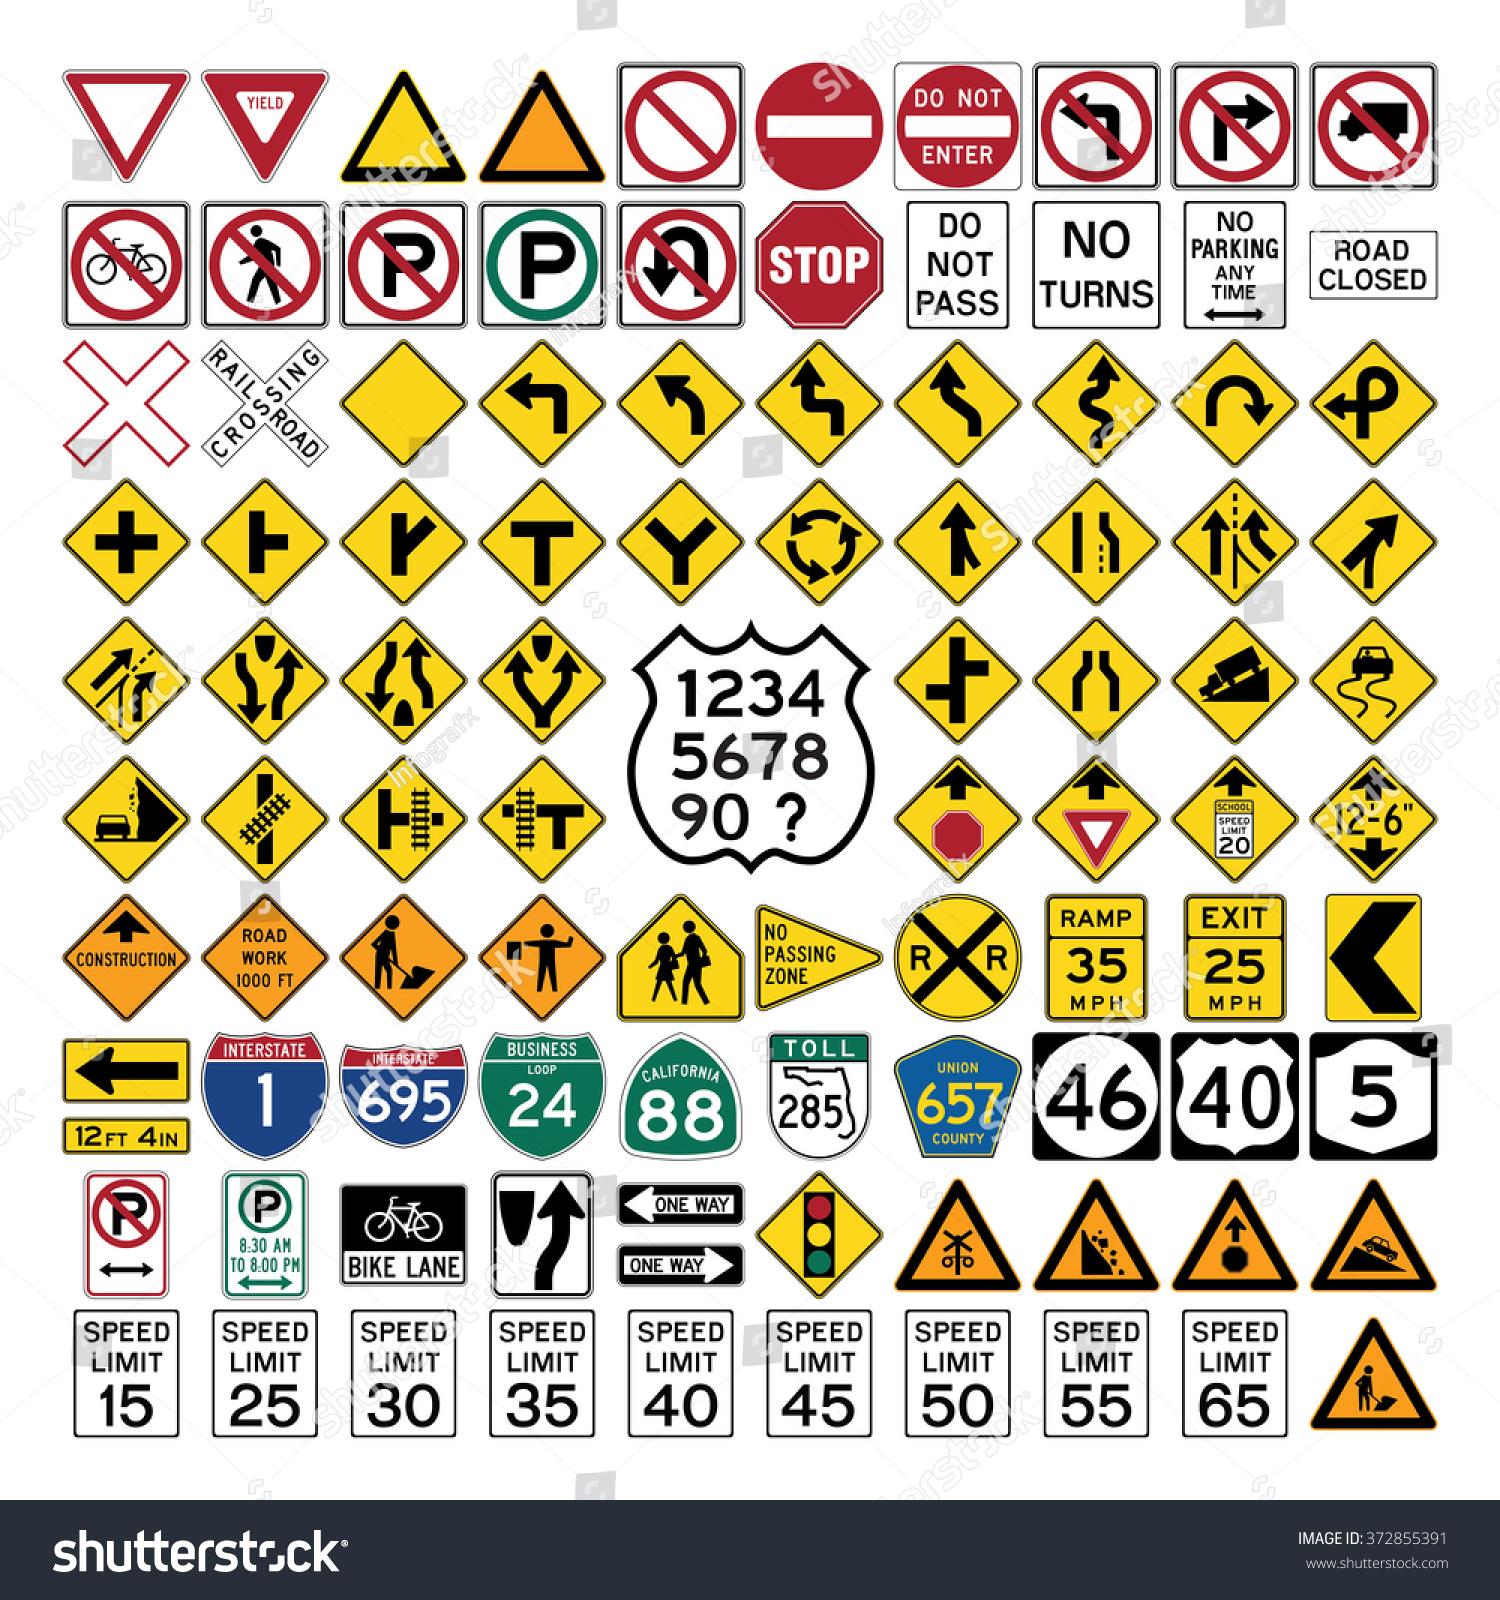 English signs and symbols